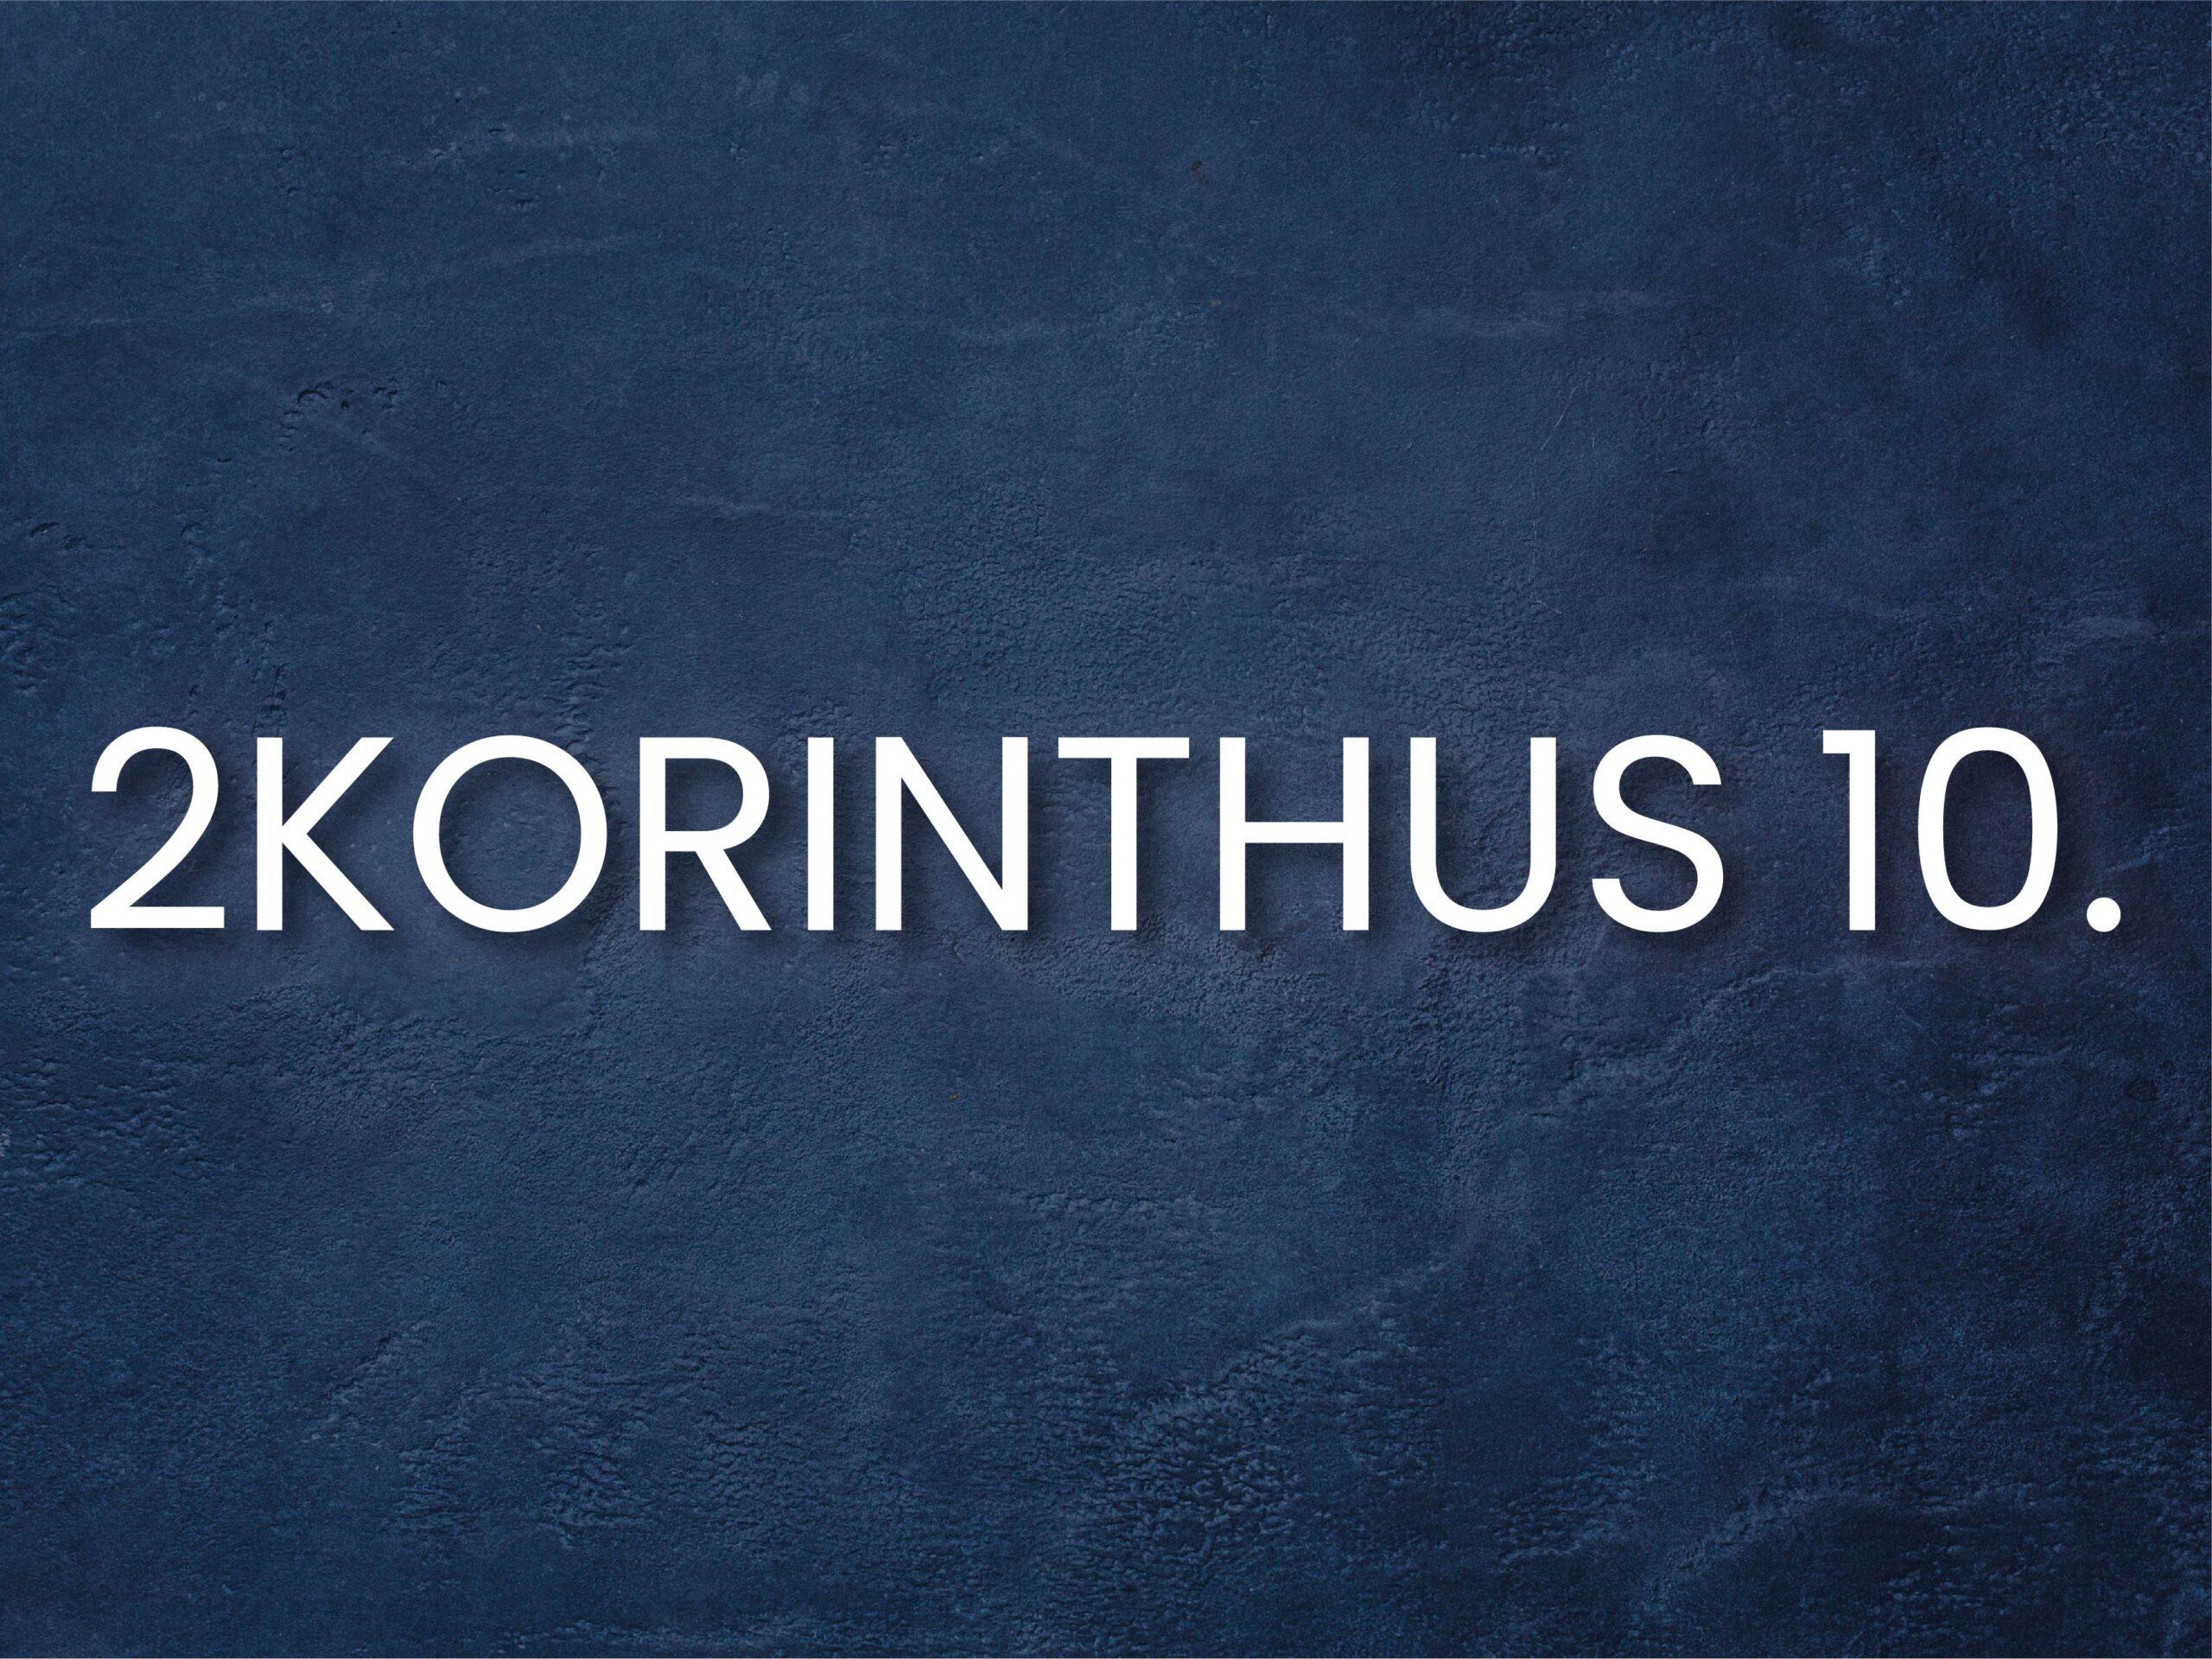 INFO_2korinthus_10